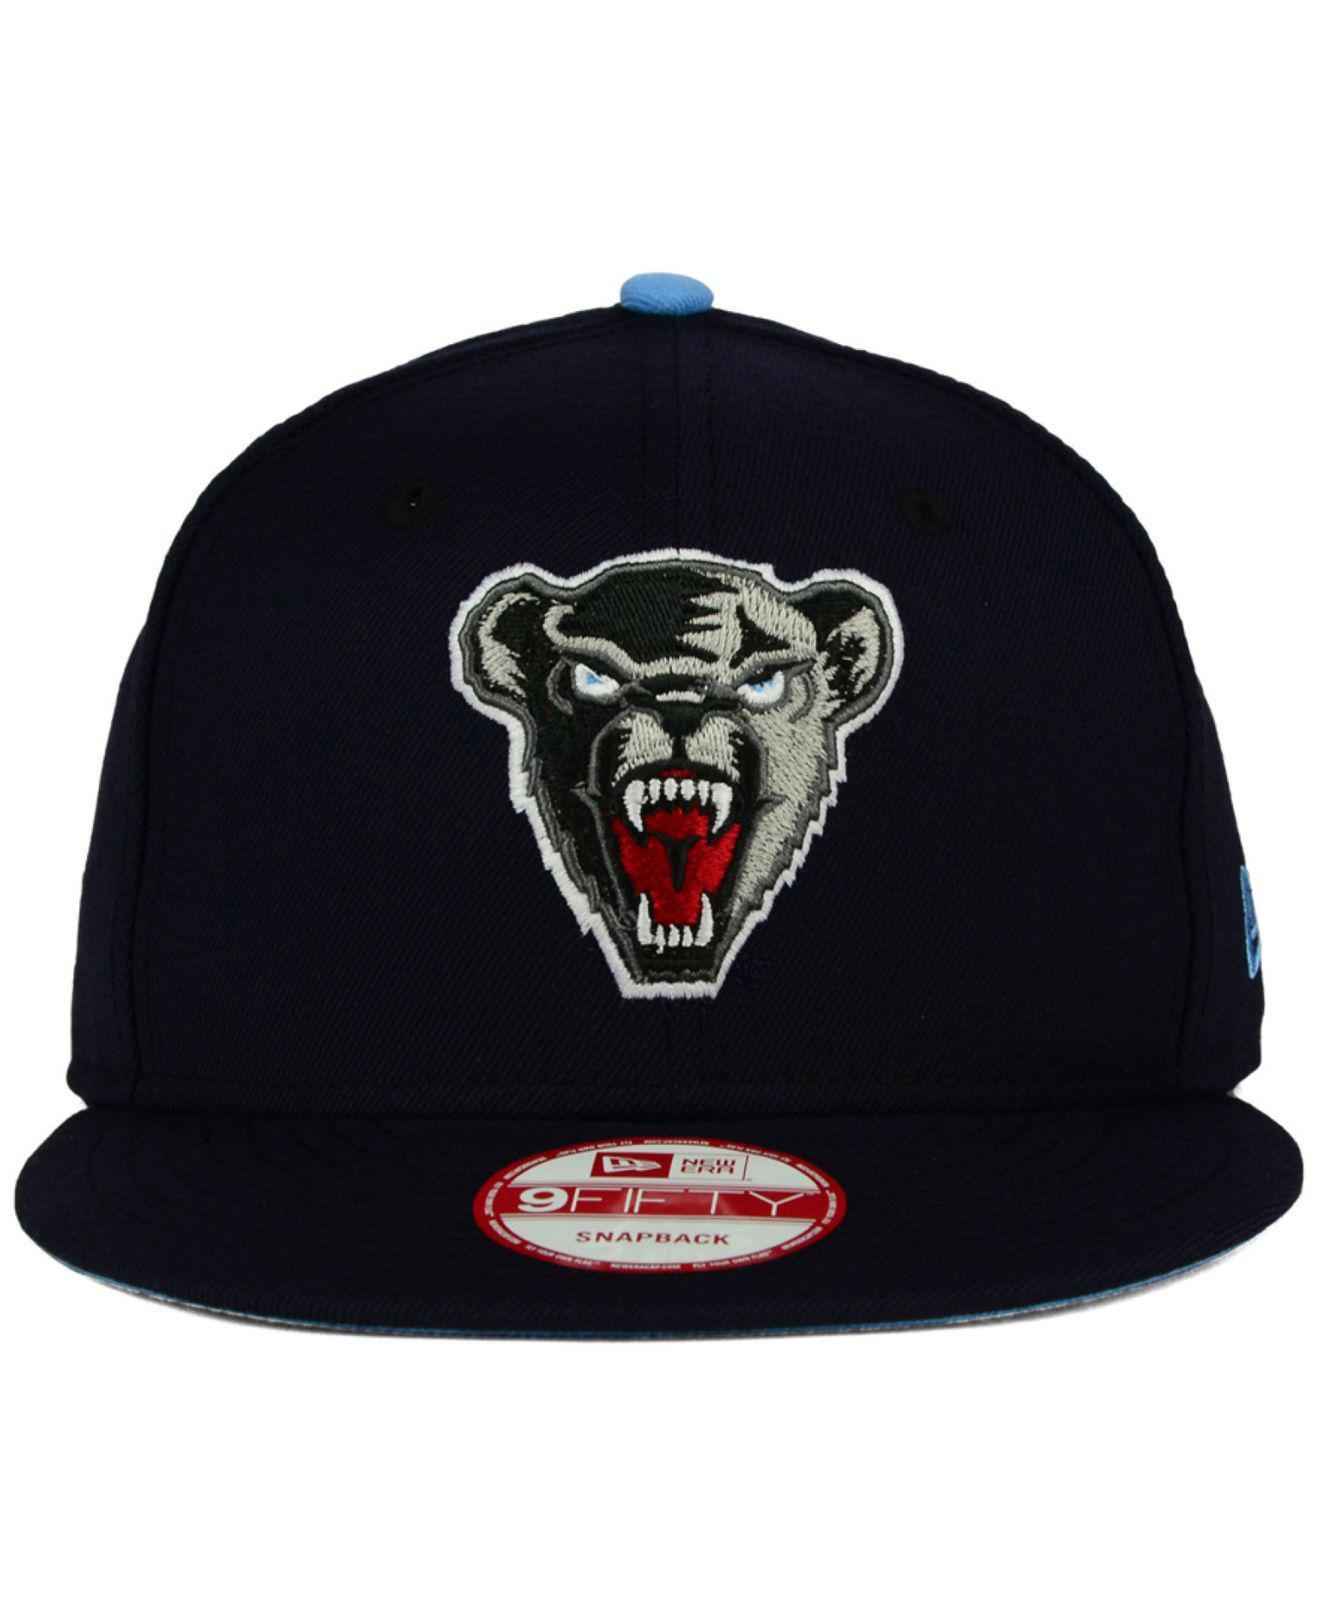 on sale 7885b 430e4 ... order lyst ktz maine black bears core 9fifty snapback cap in blue for  men 0b258 d5781